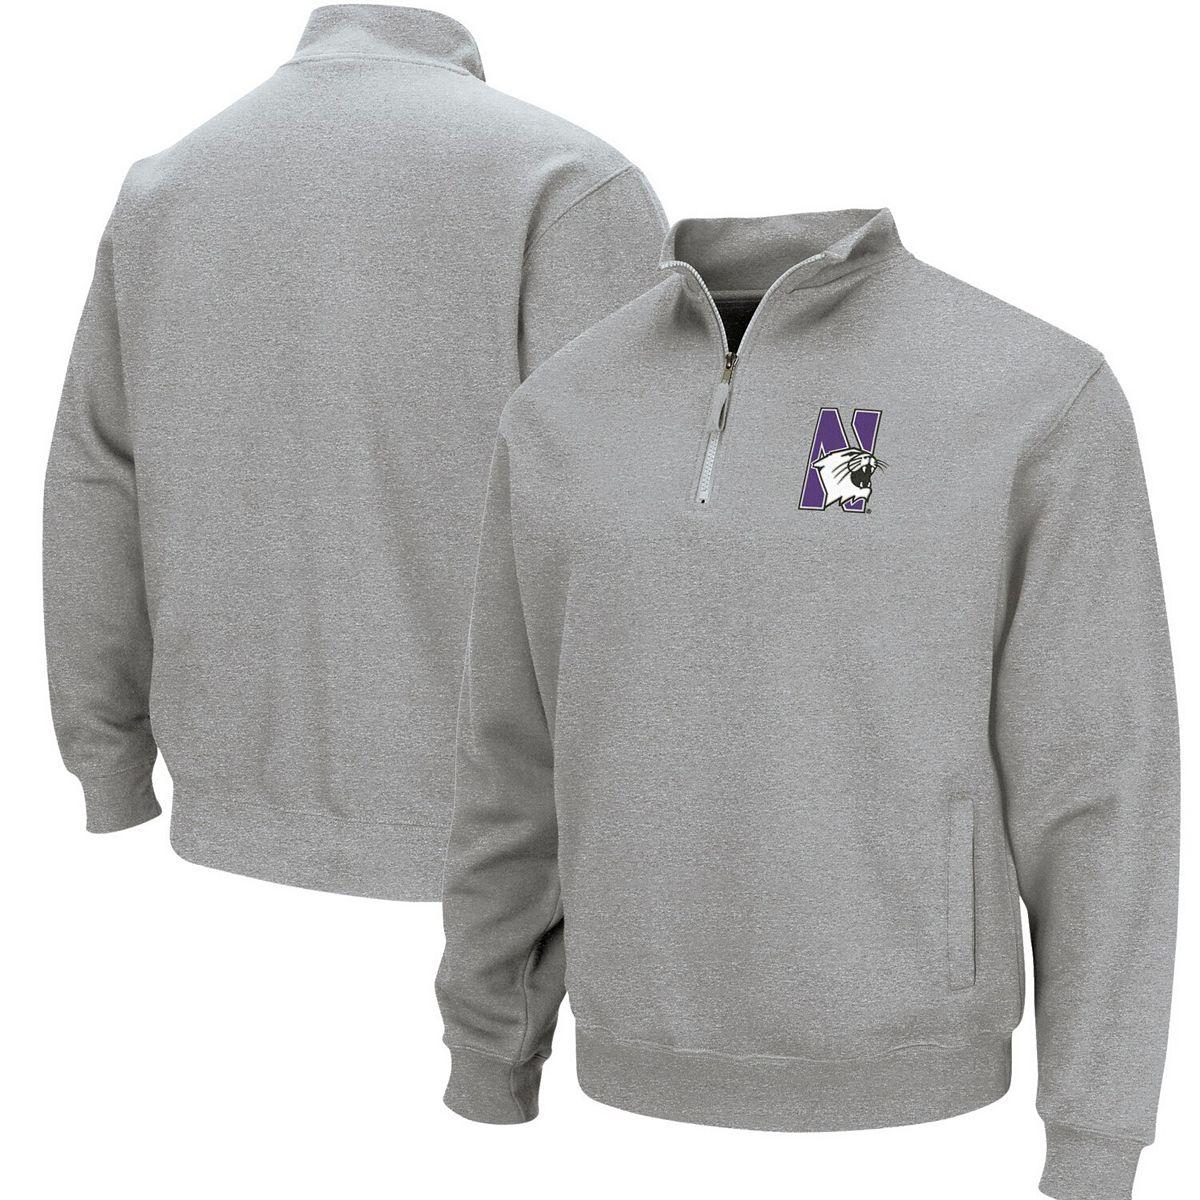 Men's Colosseum Heathered Gray Northwestern Wildcats Team Logo Quarter-Zip Pullover Jacket 2cMUK